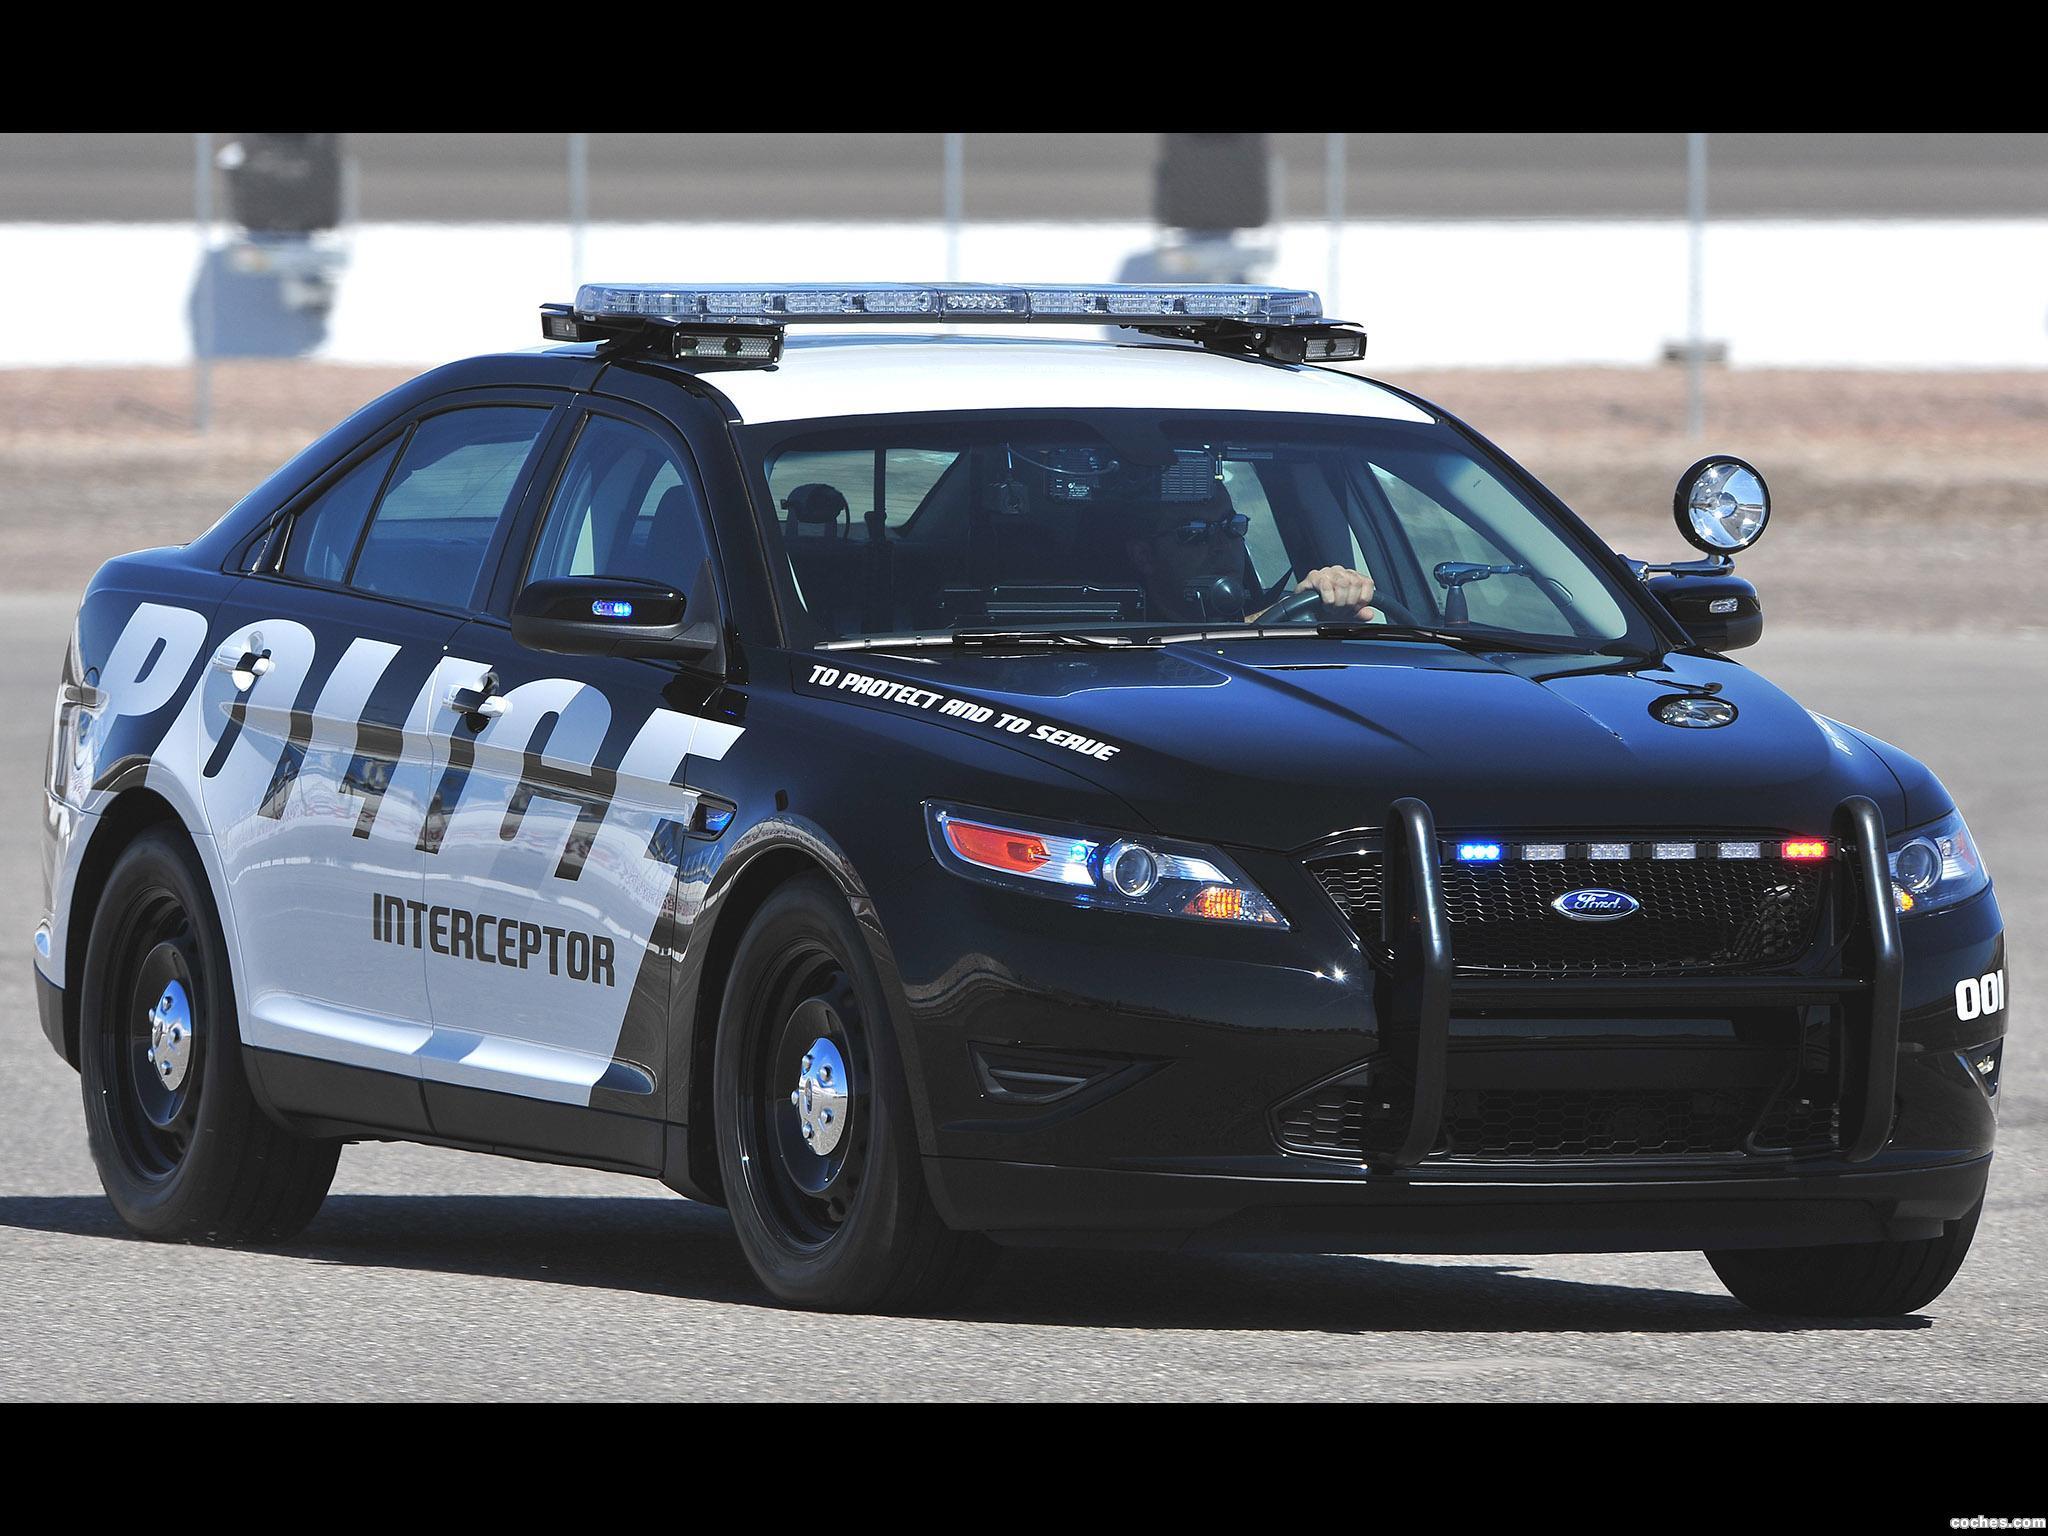 Foto 0 de Ford Interceptor Police Concept 2010